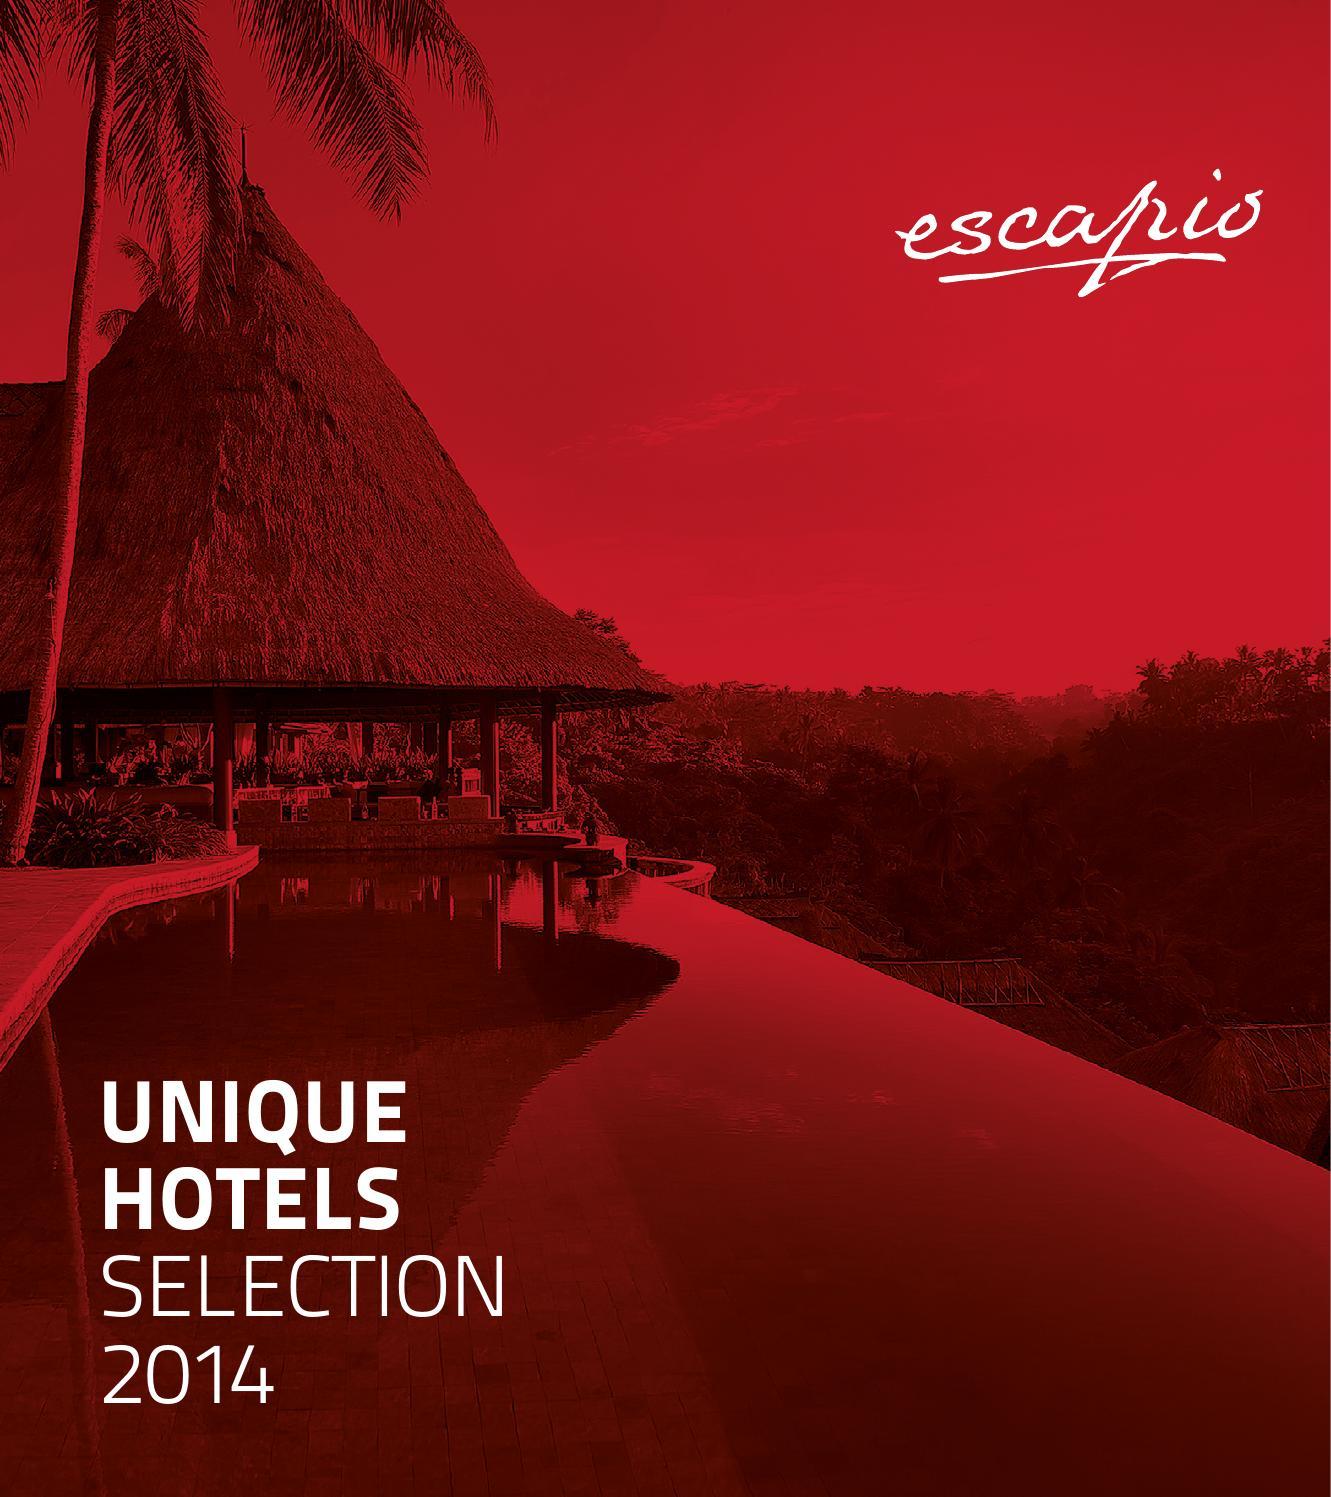 Escapio hotel booklet 2014 by escapio gmbh issuu for Escapio hotels